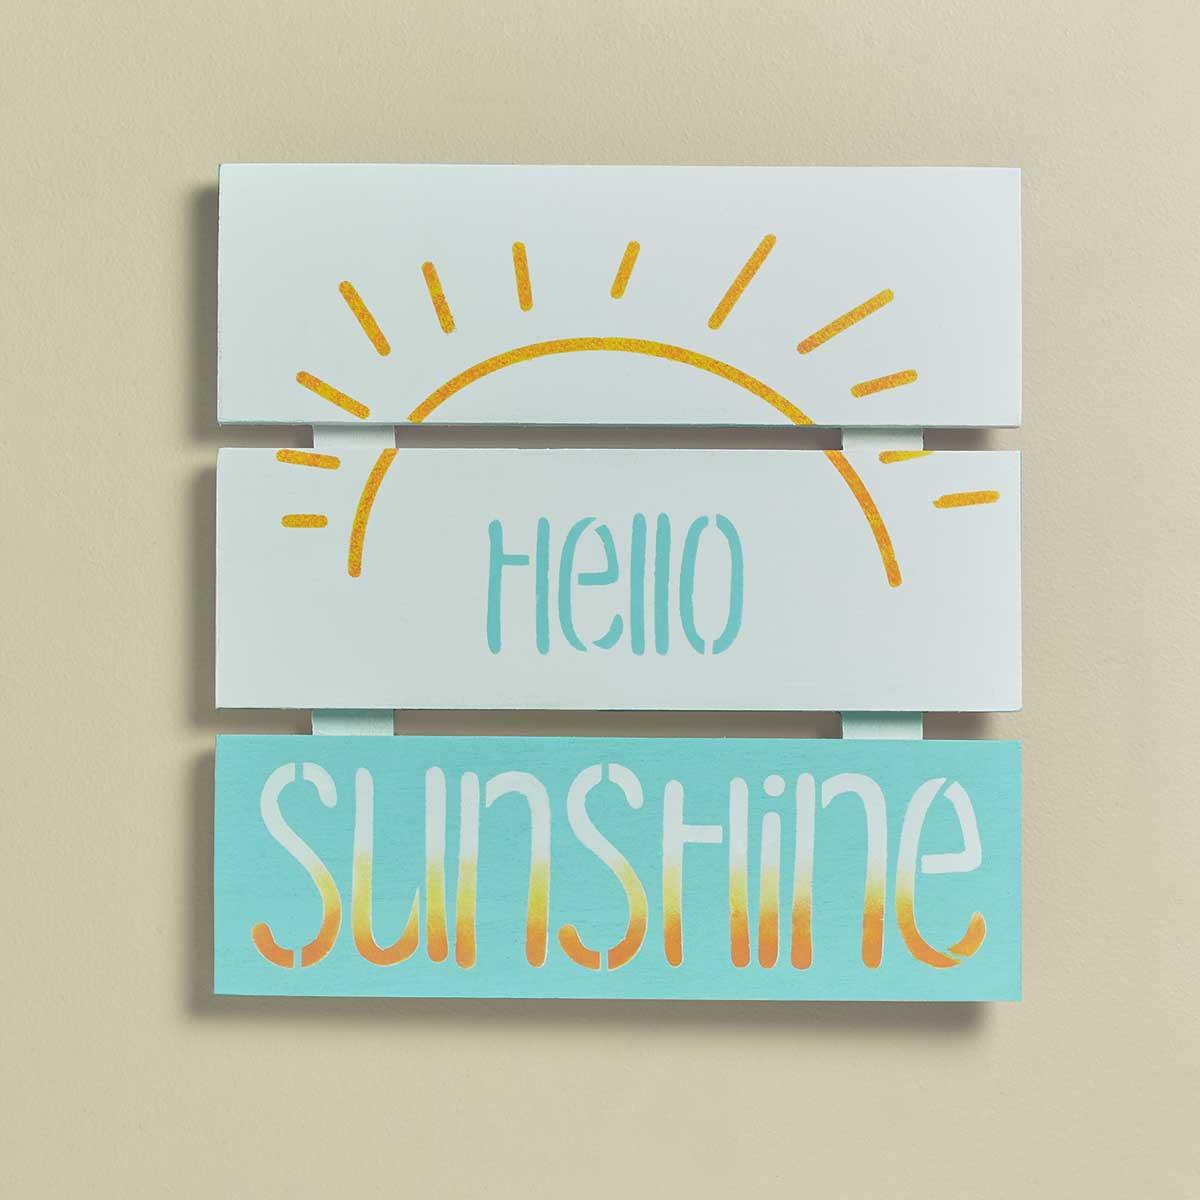 """Hello Sunshine"" Sign"